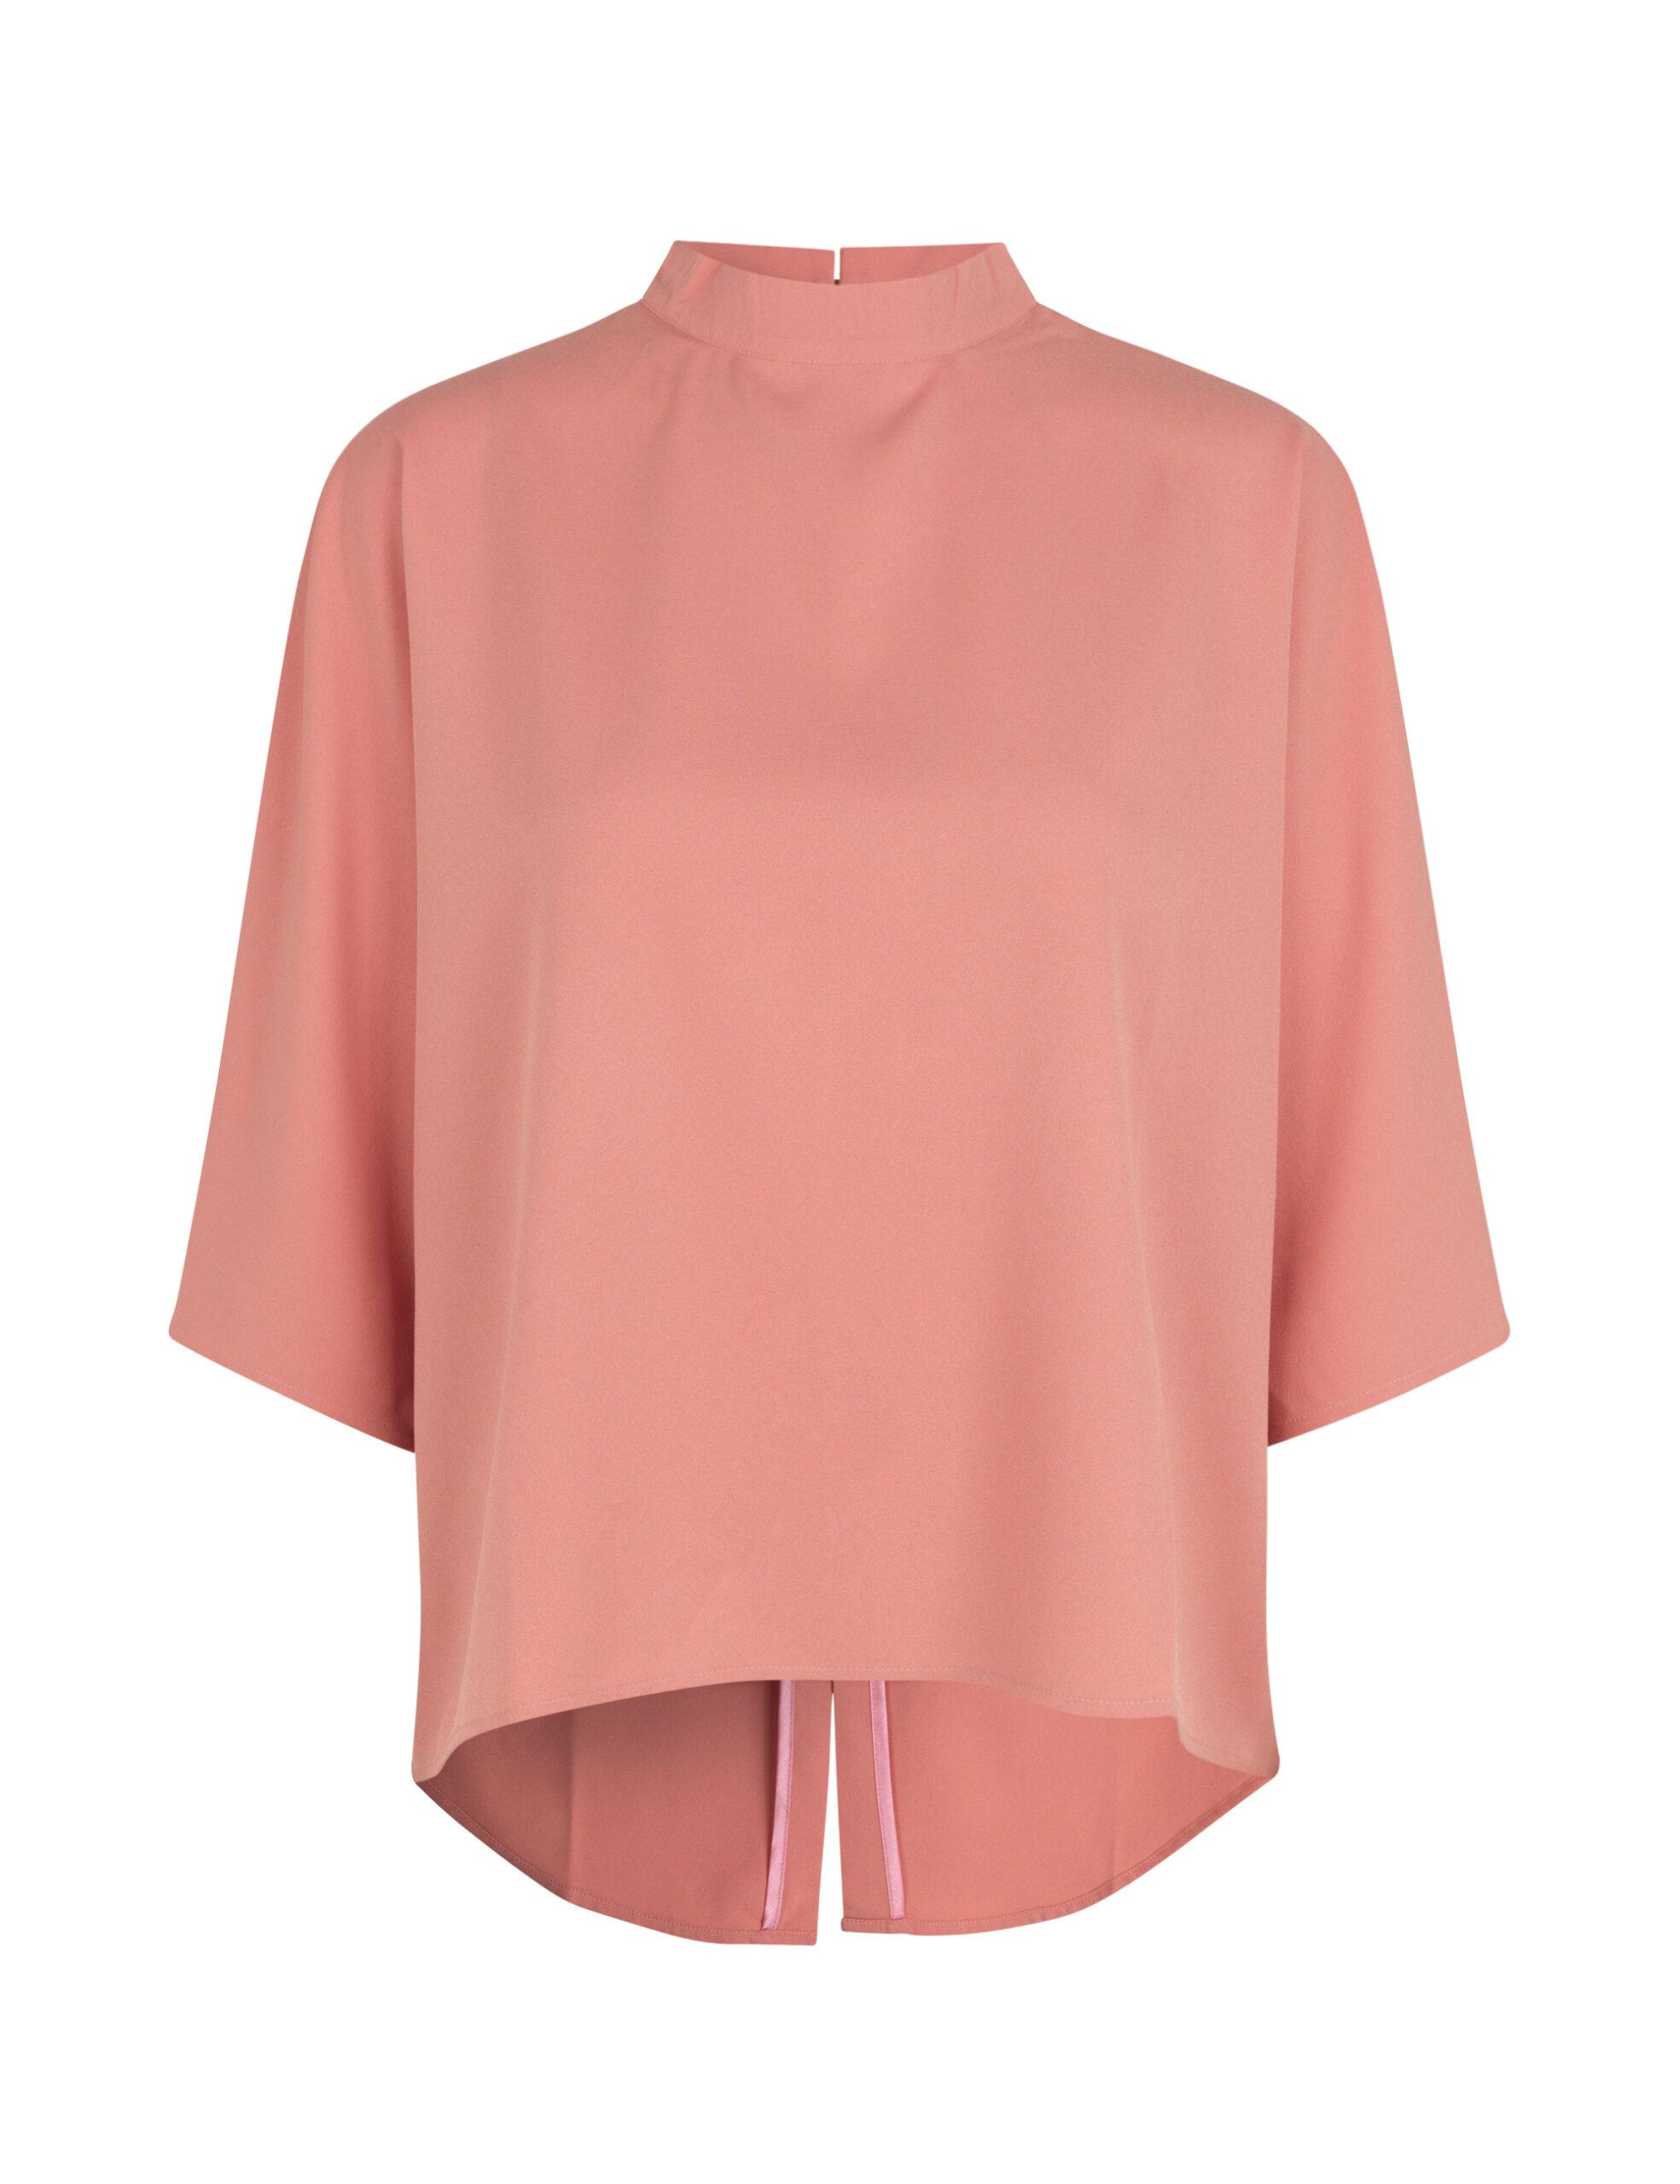 MARLIN – Pink